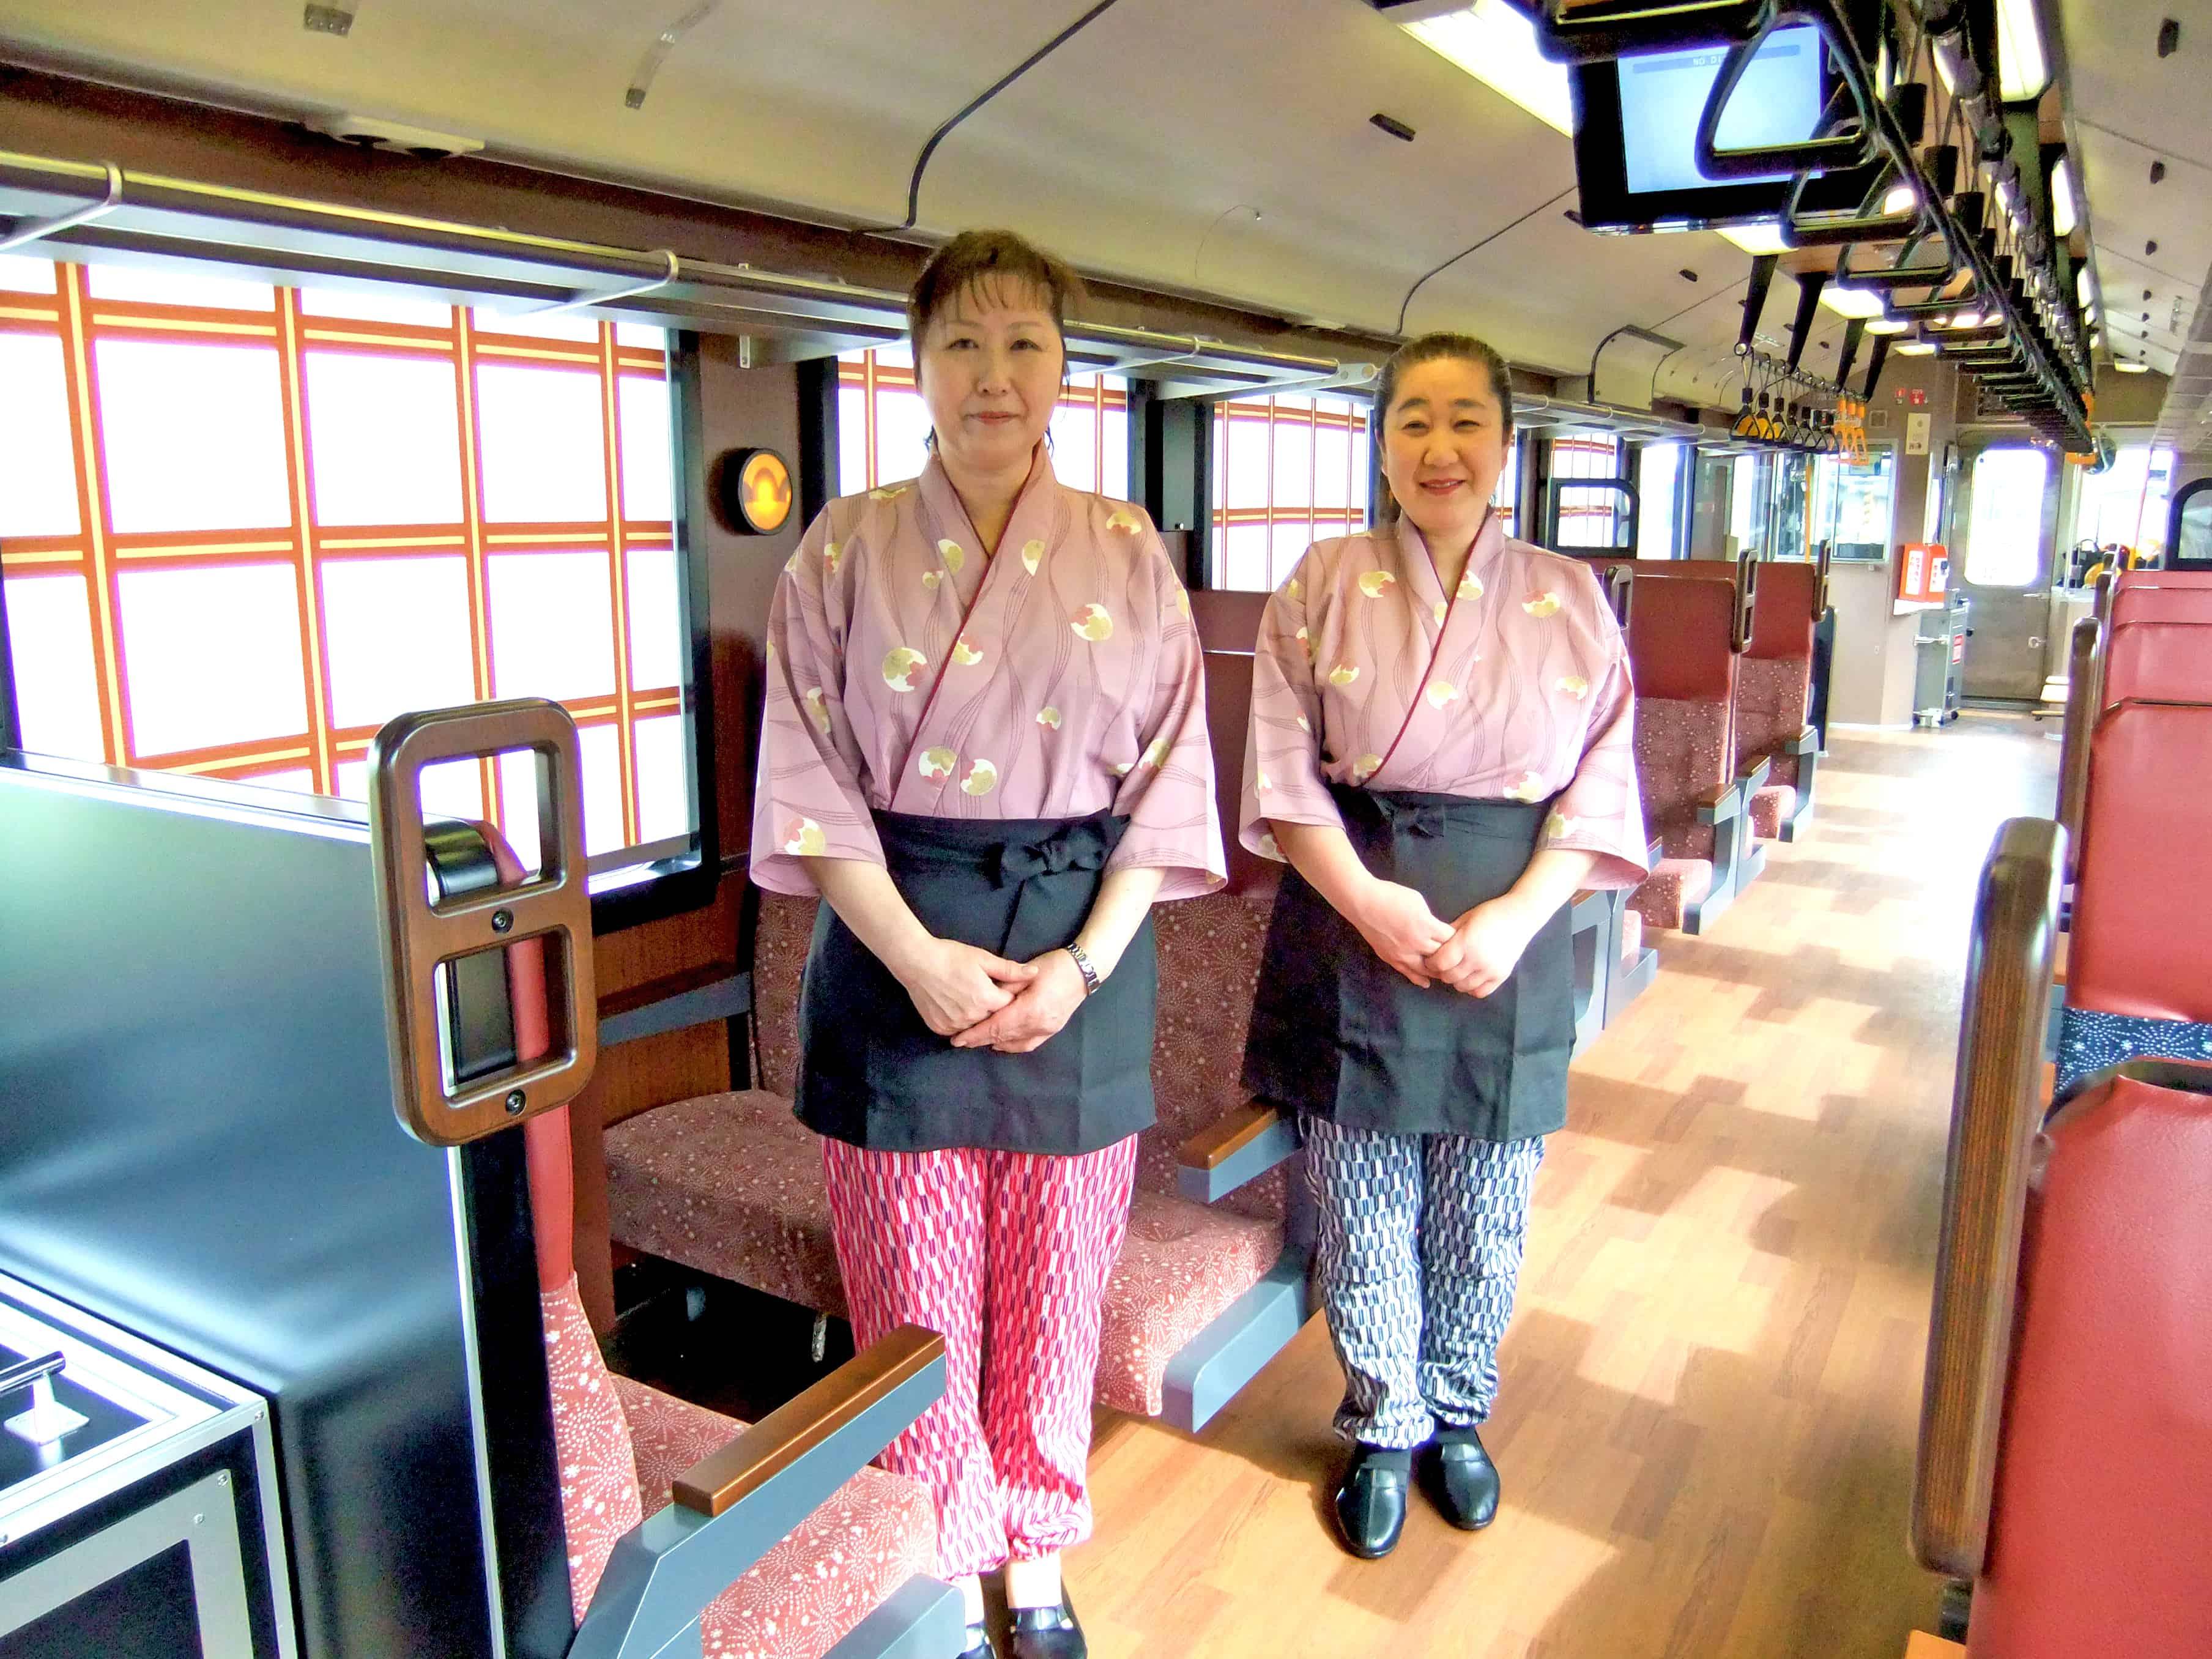 Joyful train - พนักงานต้อนรับบนรถไฟ Oykot